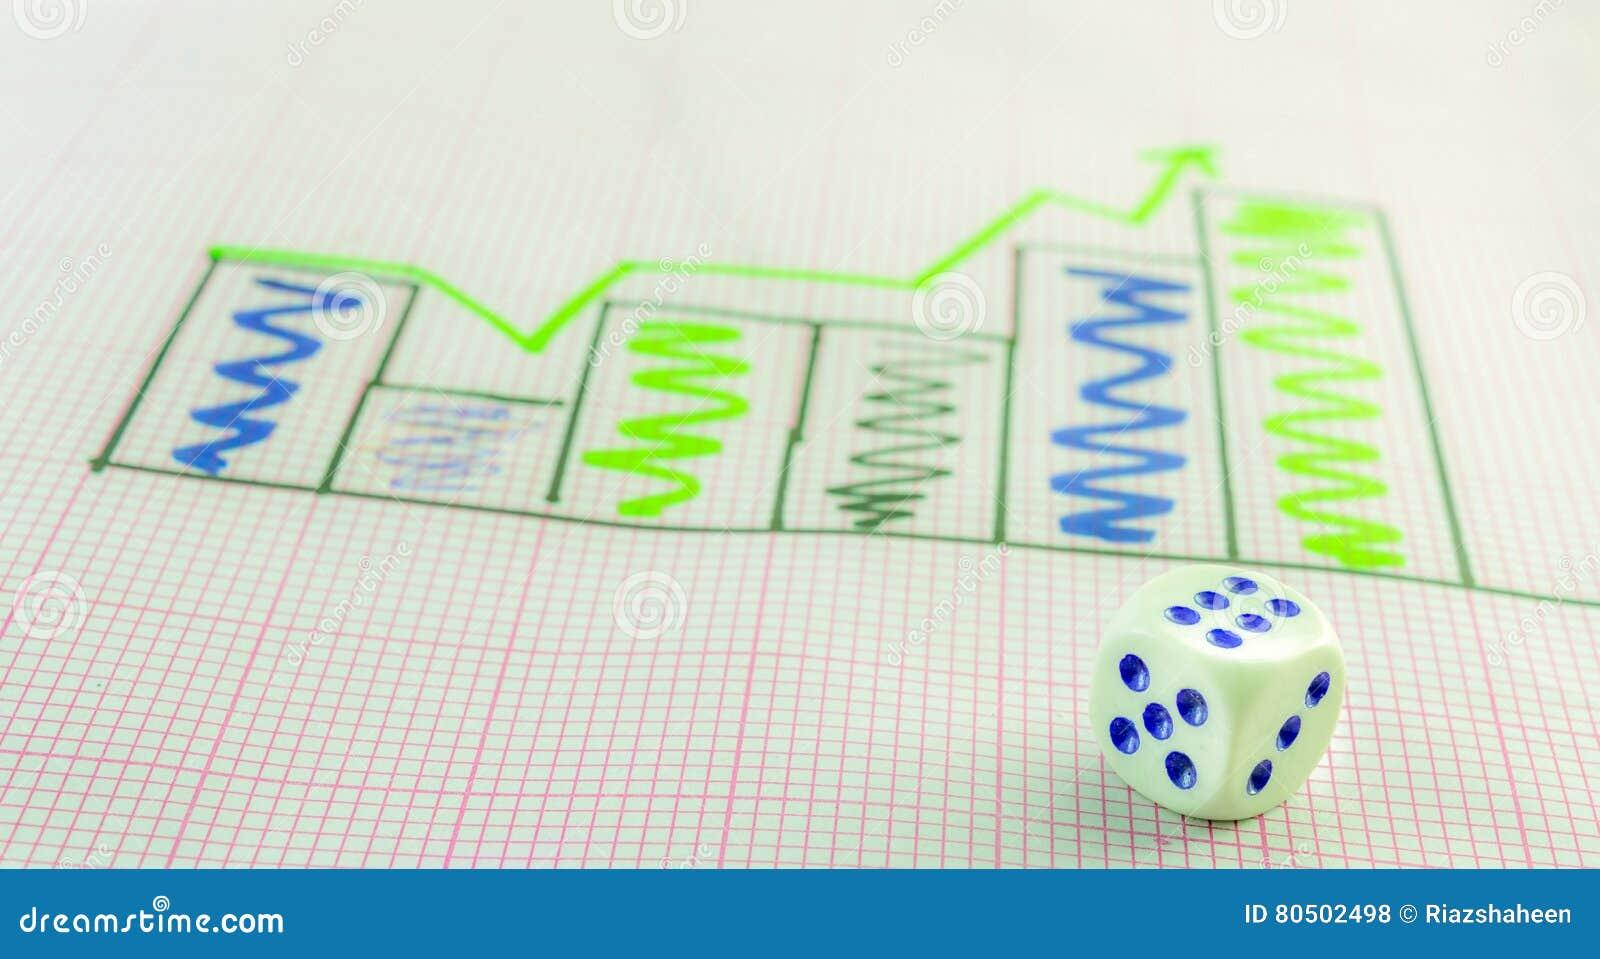 right peak histogram and 6 dice stock photo - image of achievement